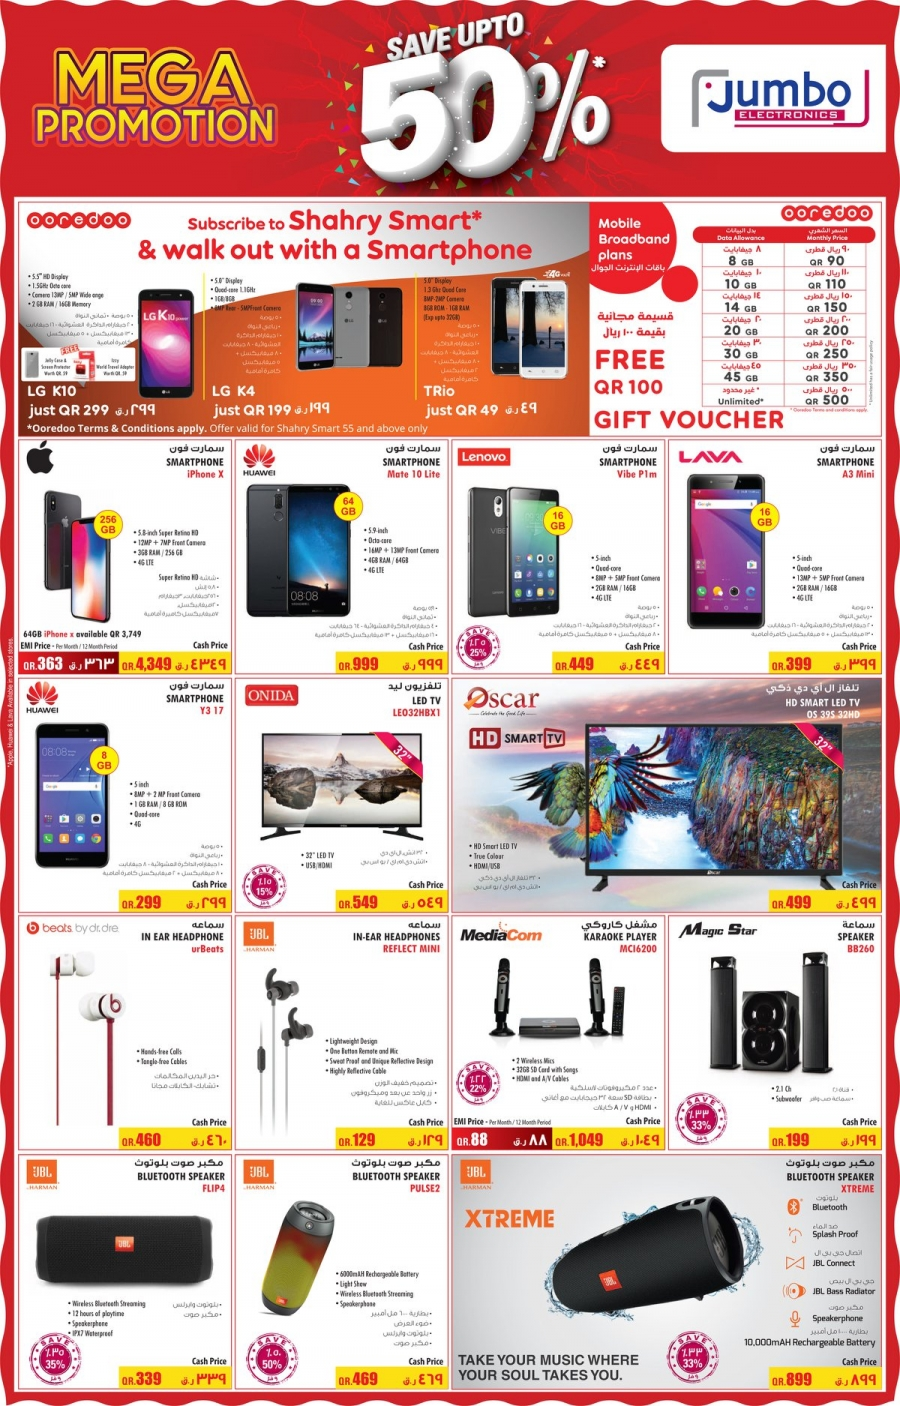 Jumbo Electronics Save Up to 50%